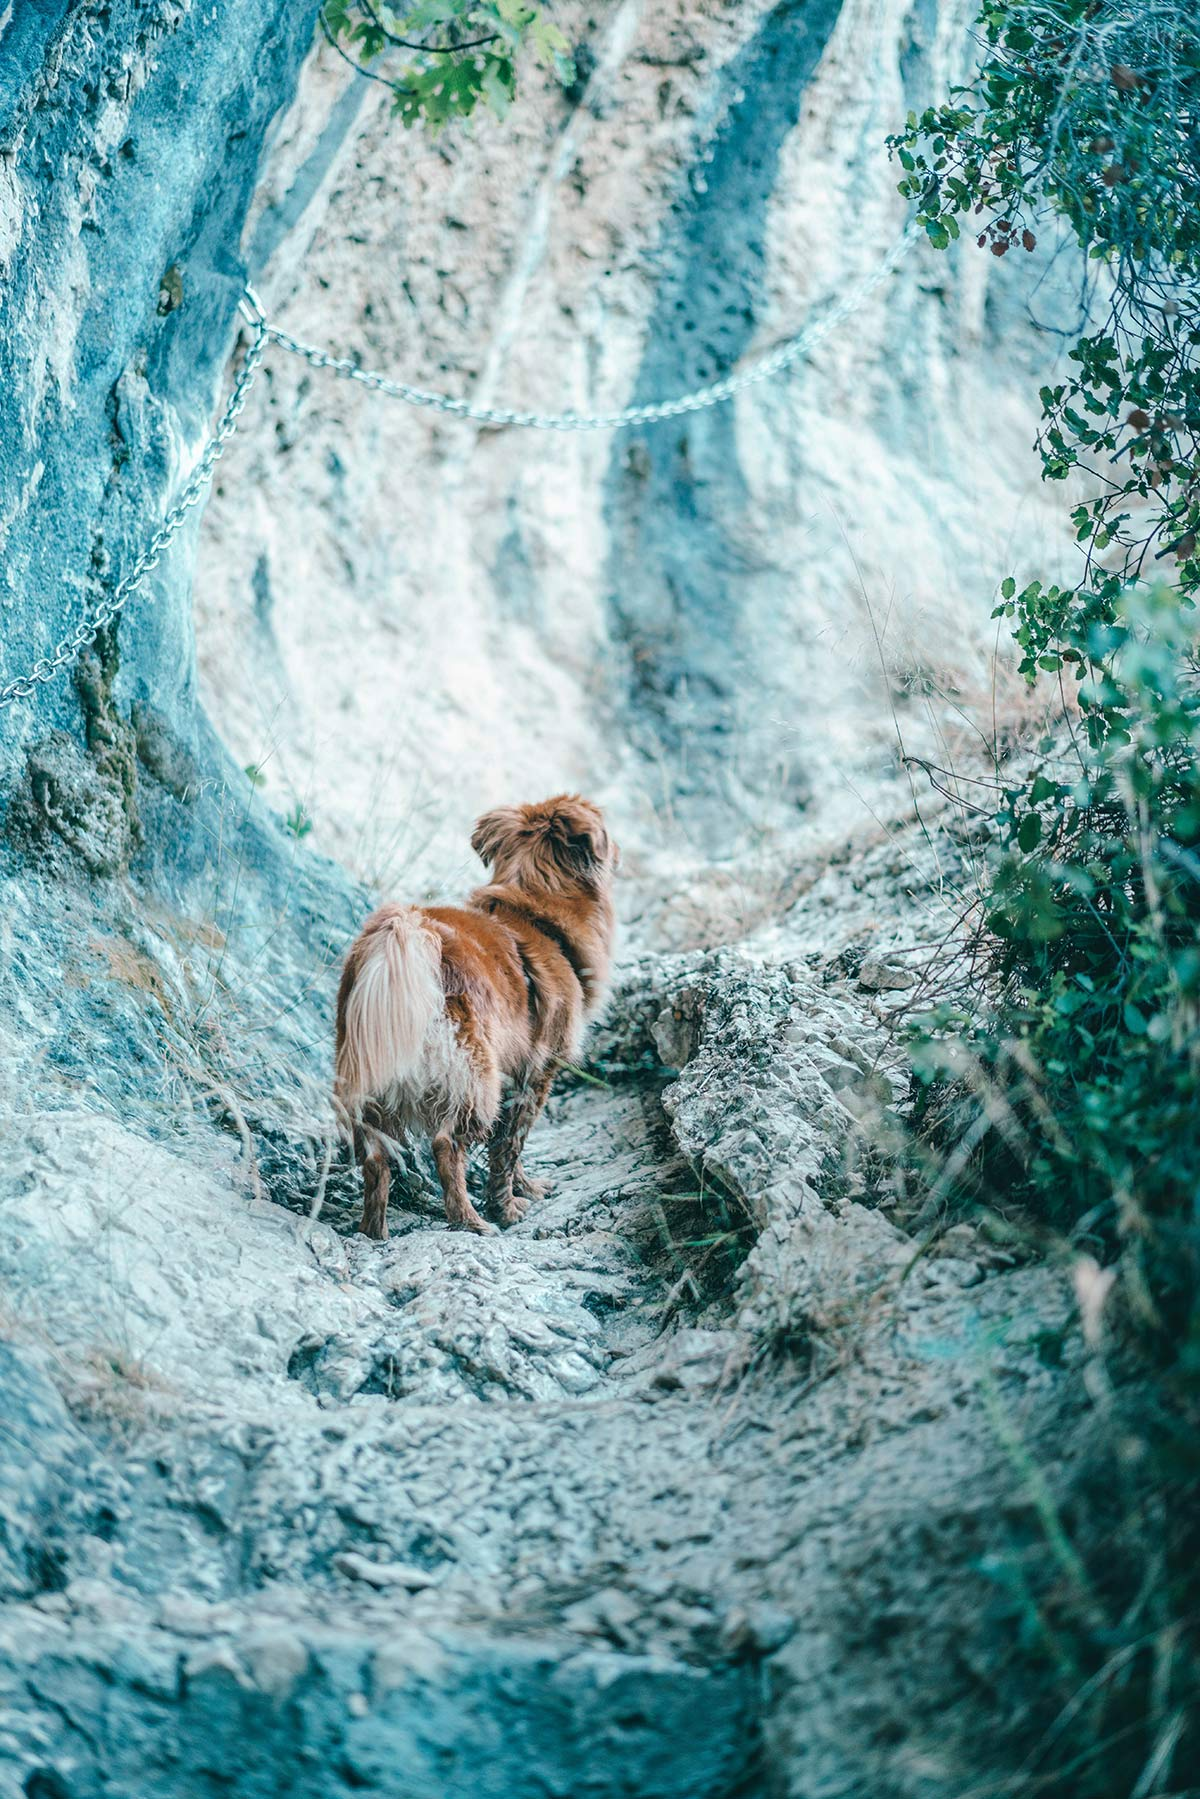 hund wanderung wandertour st remy und lac peirou